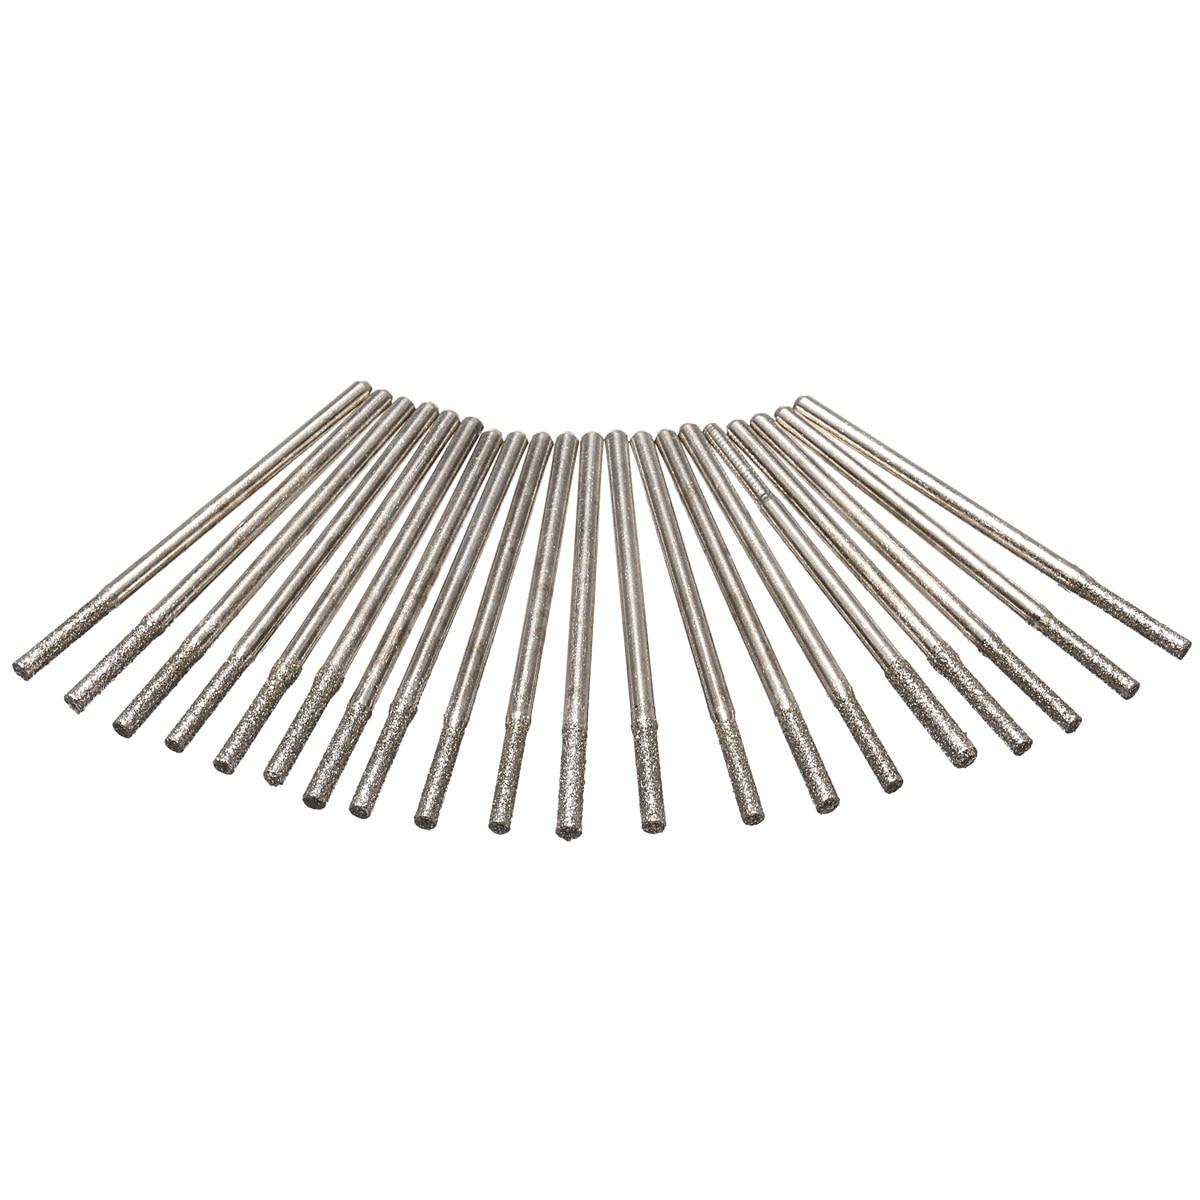 20 X 2mm Diamond Drill Bits Set Hole Saw Cutter Tool Ceramic Marble Tile